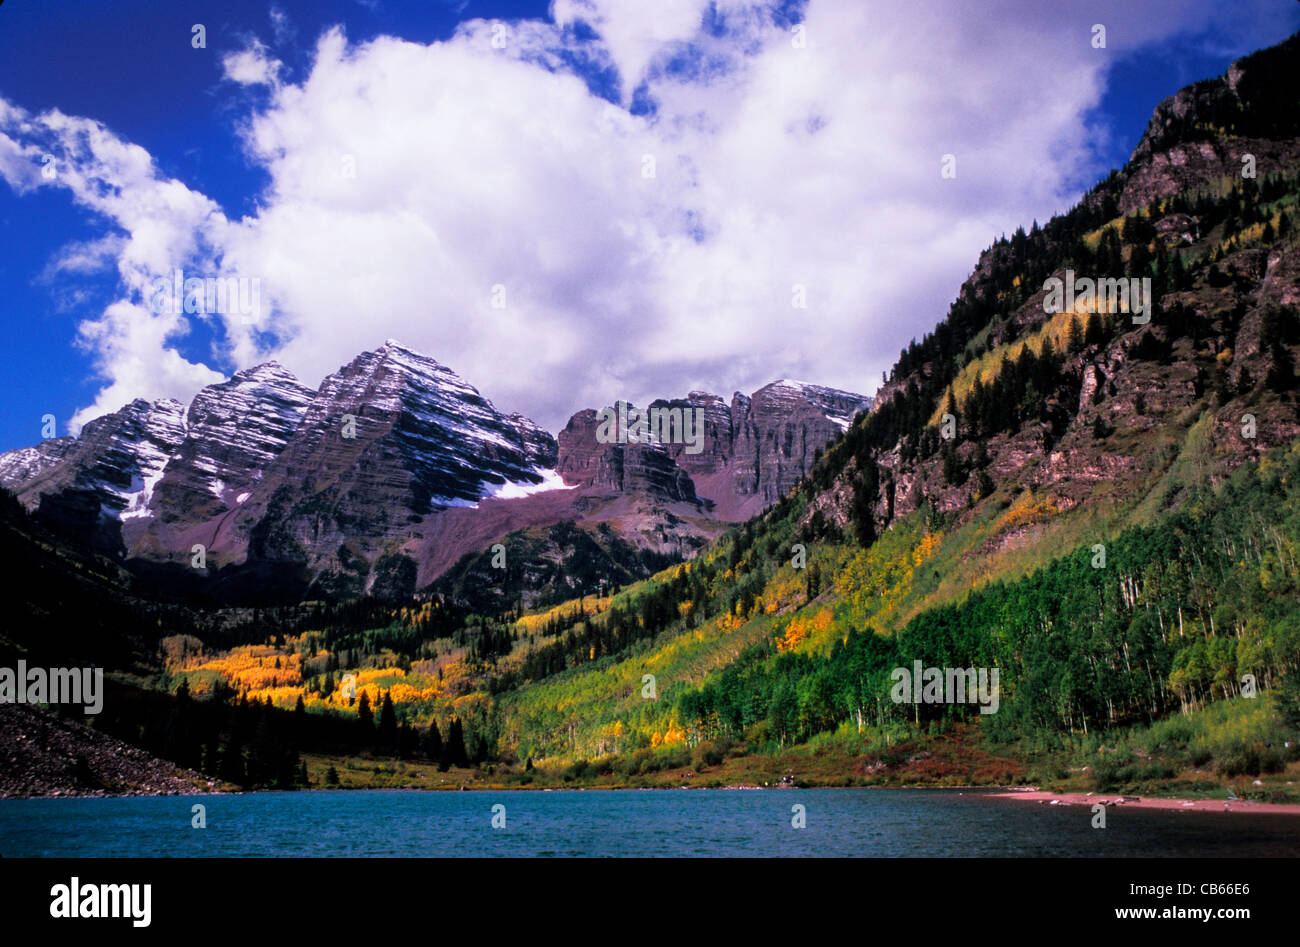 Maroon Lake Maroon Bells peaks en White River National Forest près de Aspen Les Rocheuses Colorado USA Photo Stock